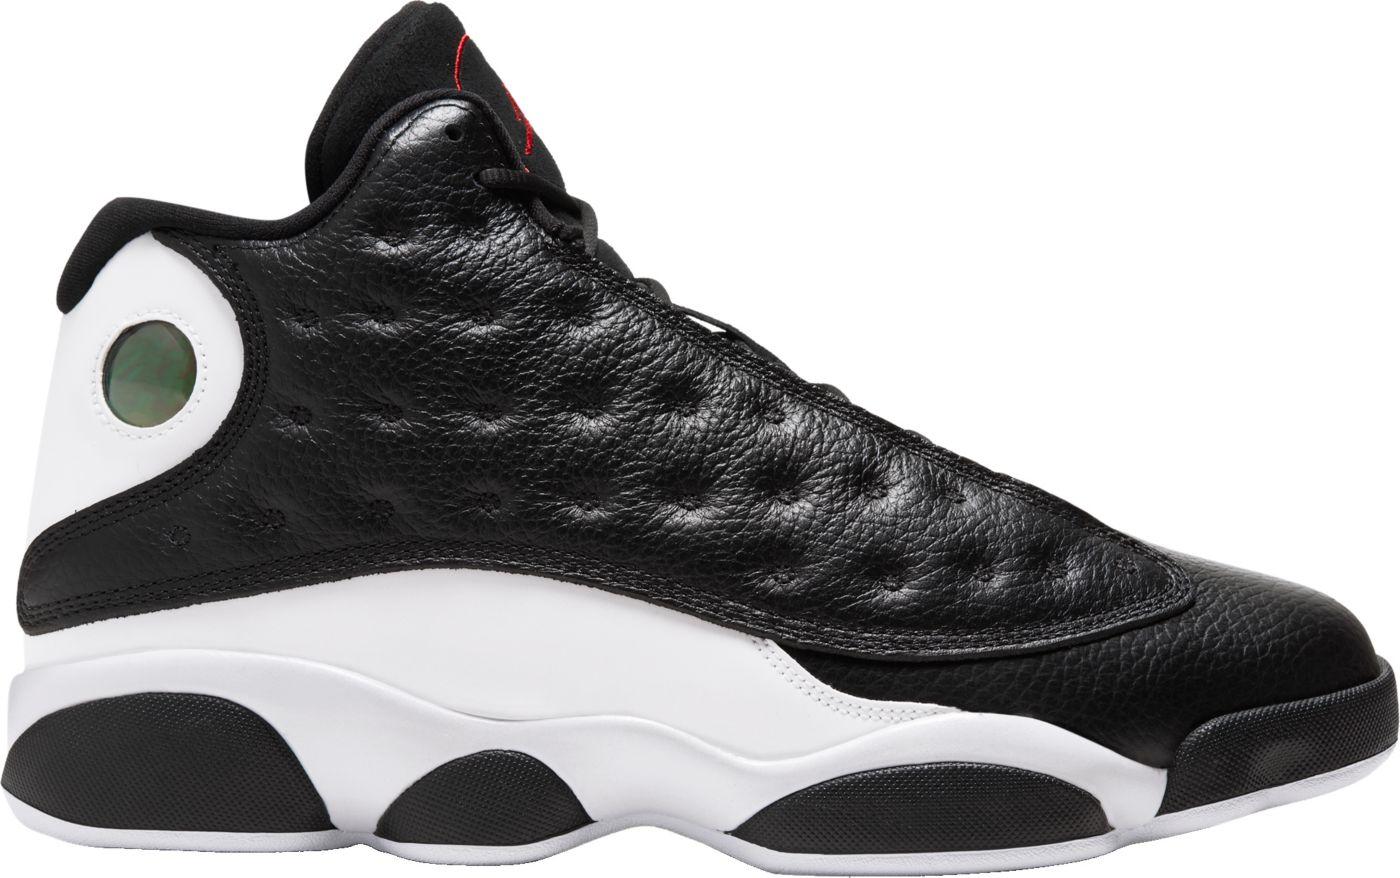 Jordan Air Jordan 13 Retro Basketball Shoes